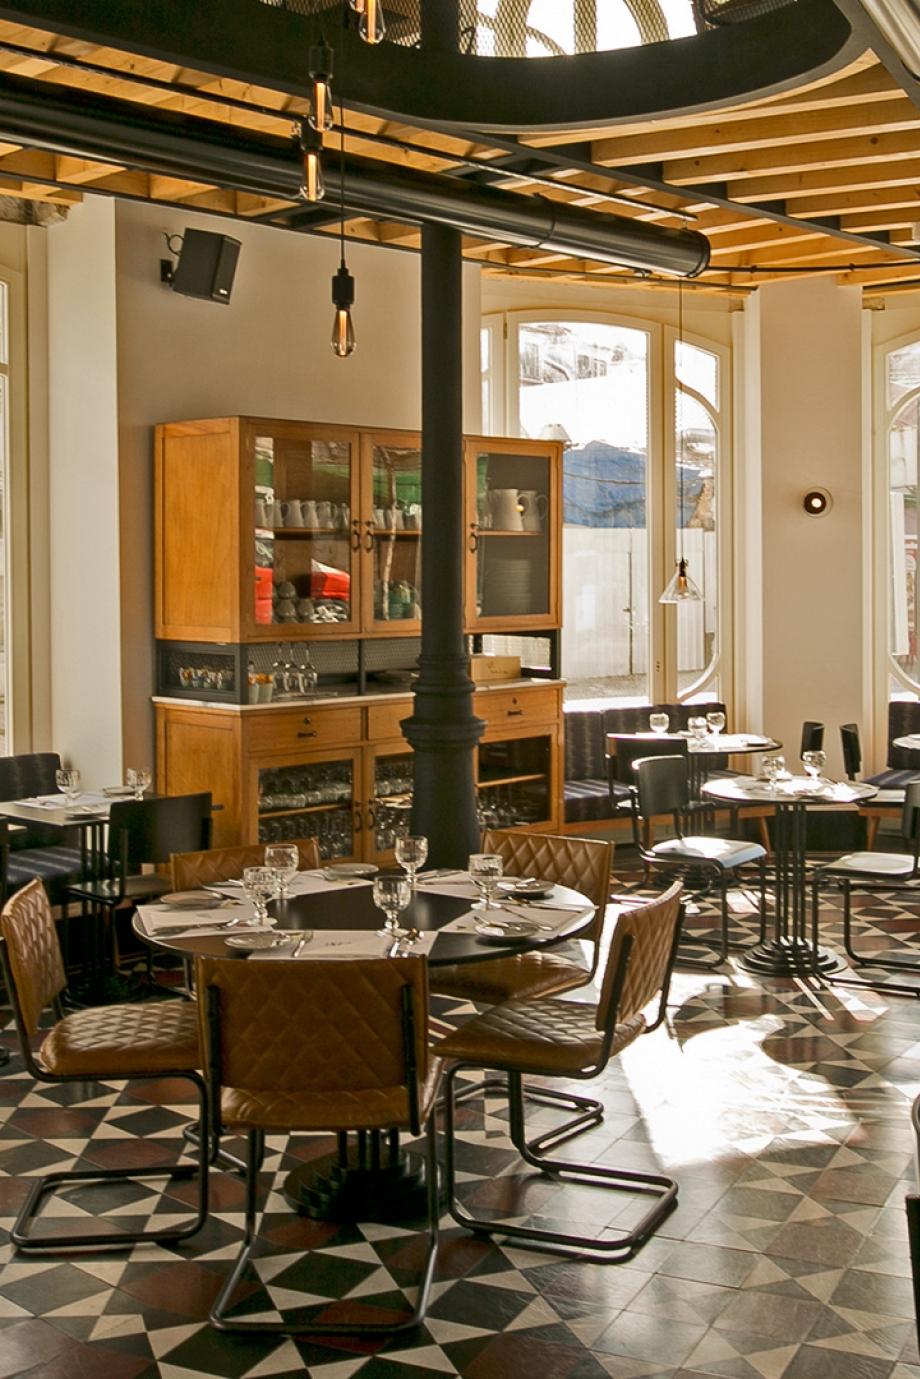 LisboaCool_Blog_Quintas-feiras a dois no restaurante Infame